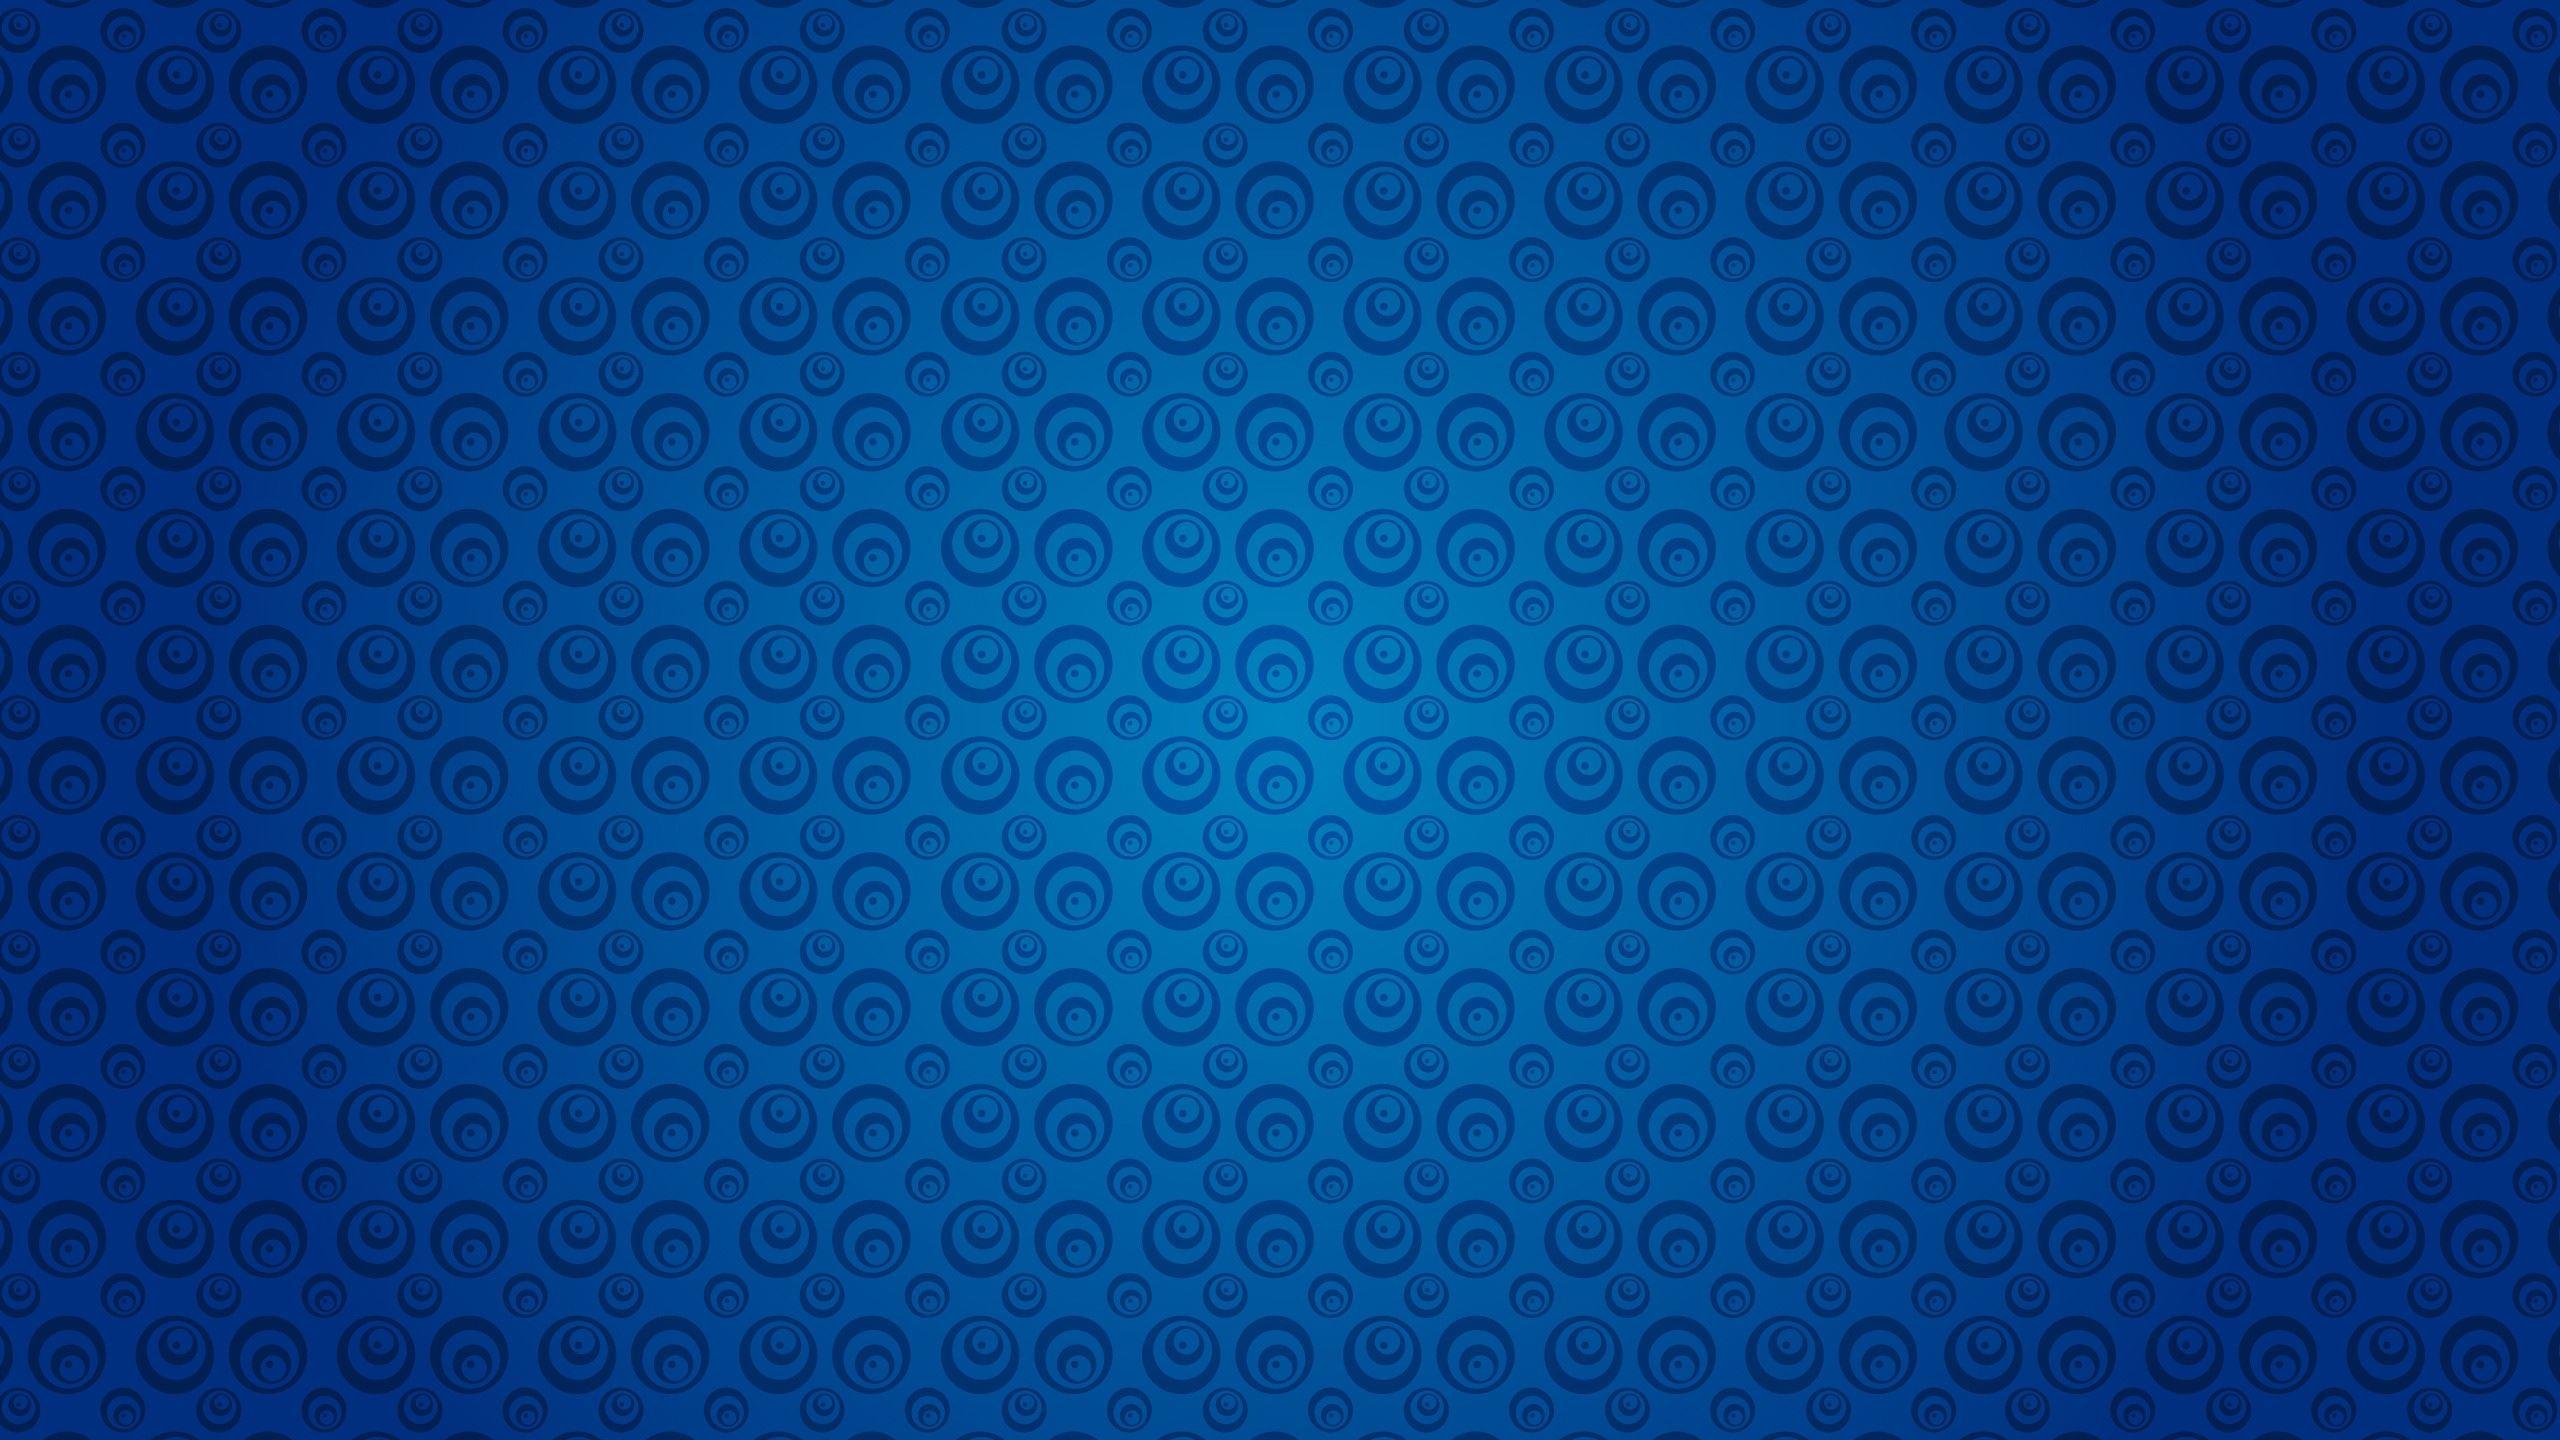 Iphone 5s Colors Blue retro pattern Mac...